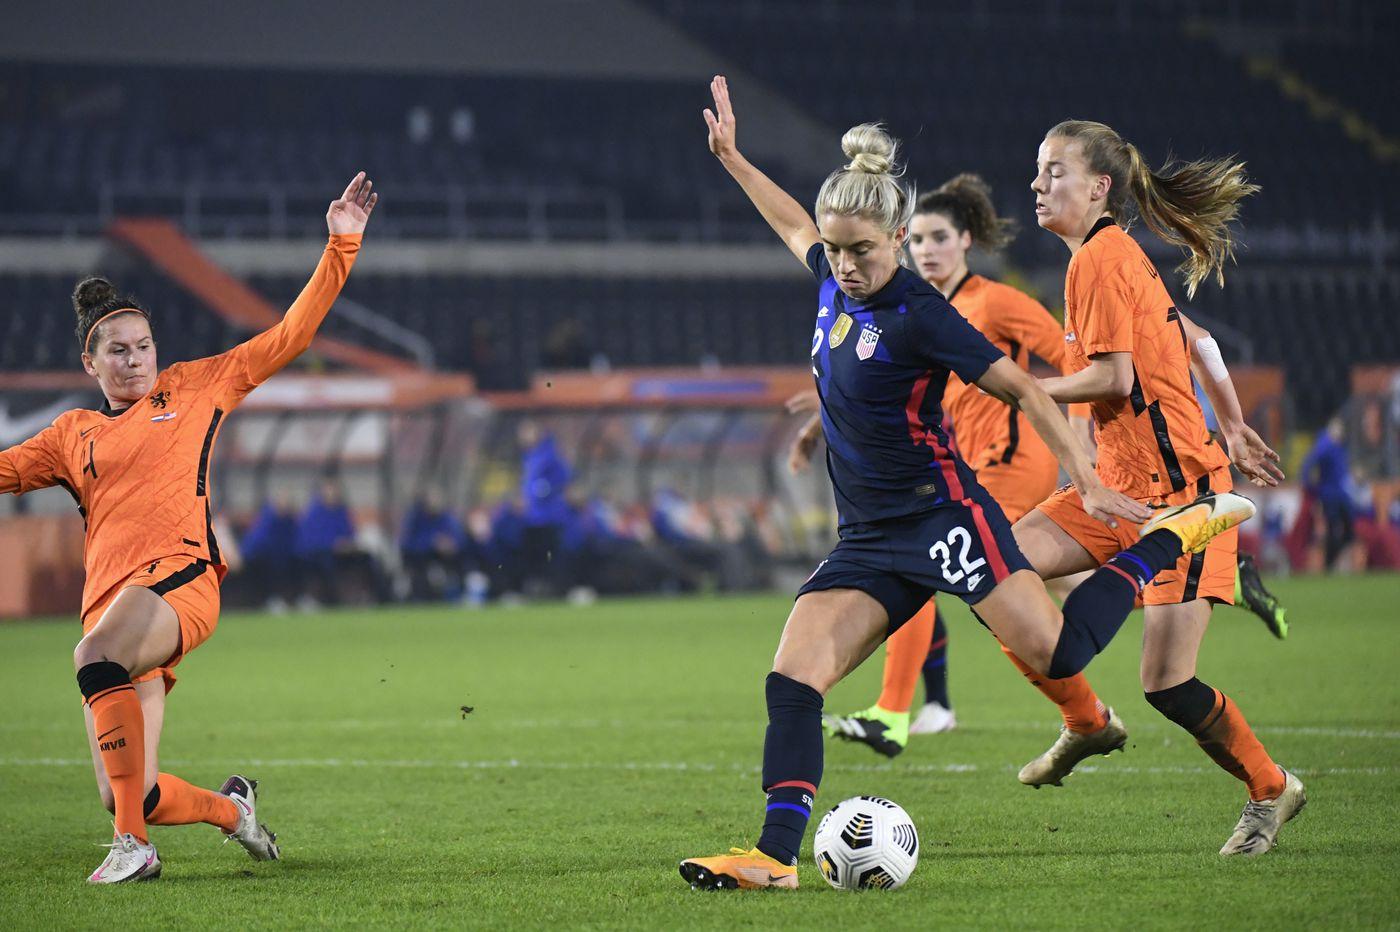 U.S. women's soccer team beats Netherlands, 2-0, in World Cup rematch